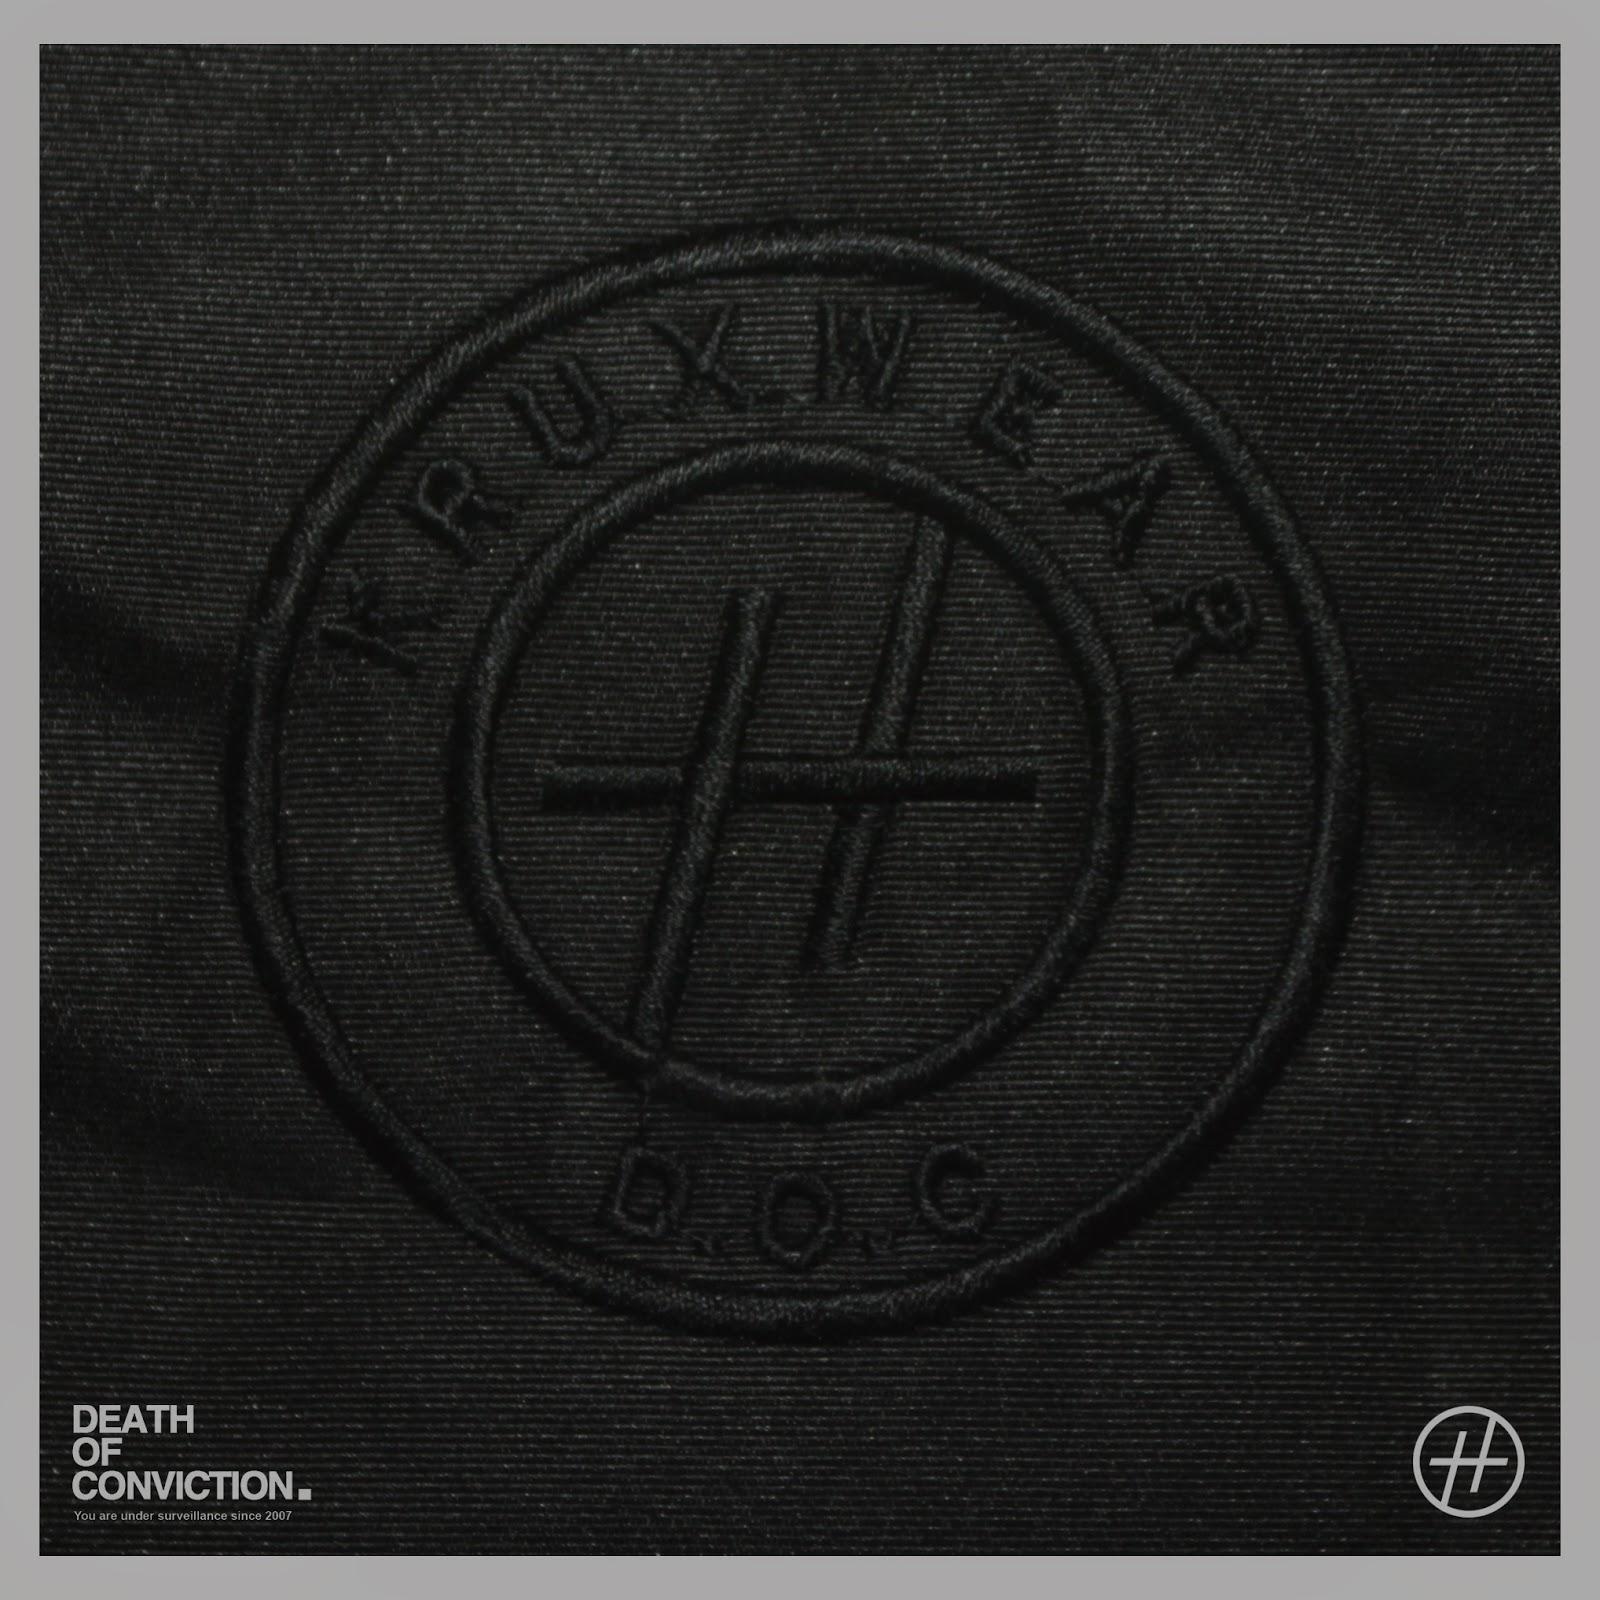 http://kruxwear.blogspot.com/2015/04/doc-circle-logo.html